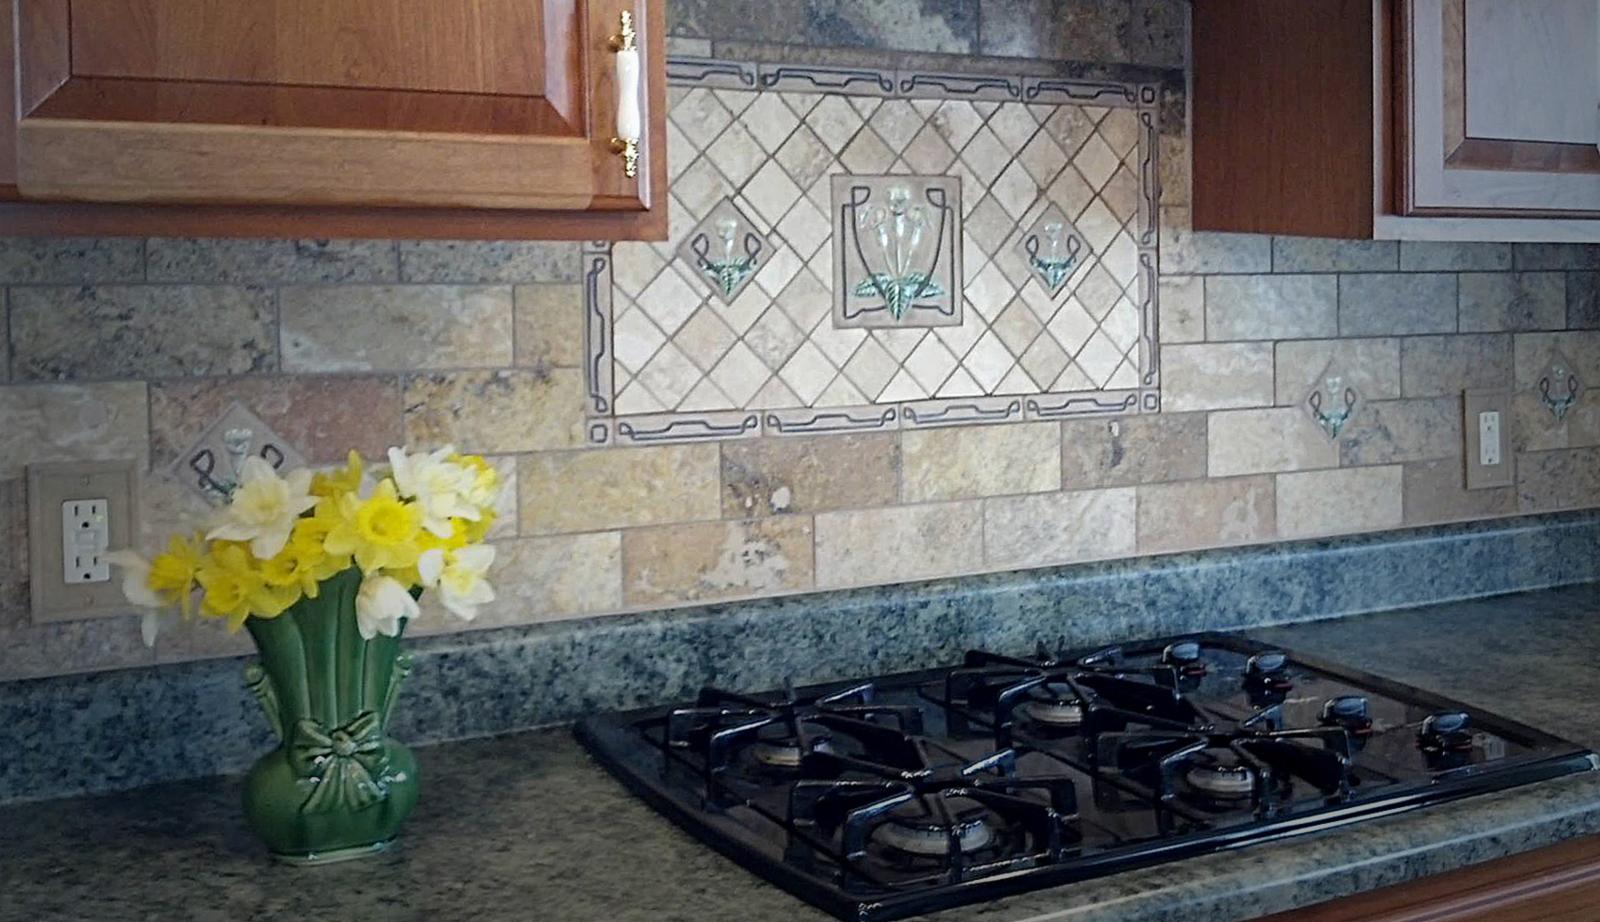 shearrow-tile-installation.jpg